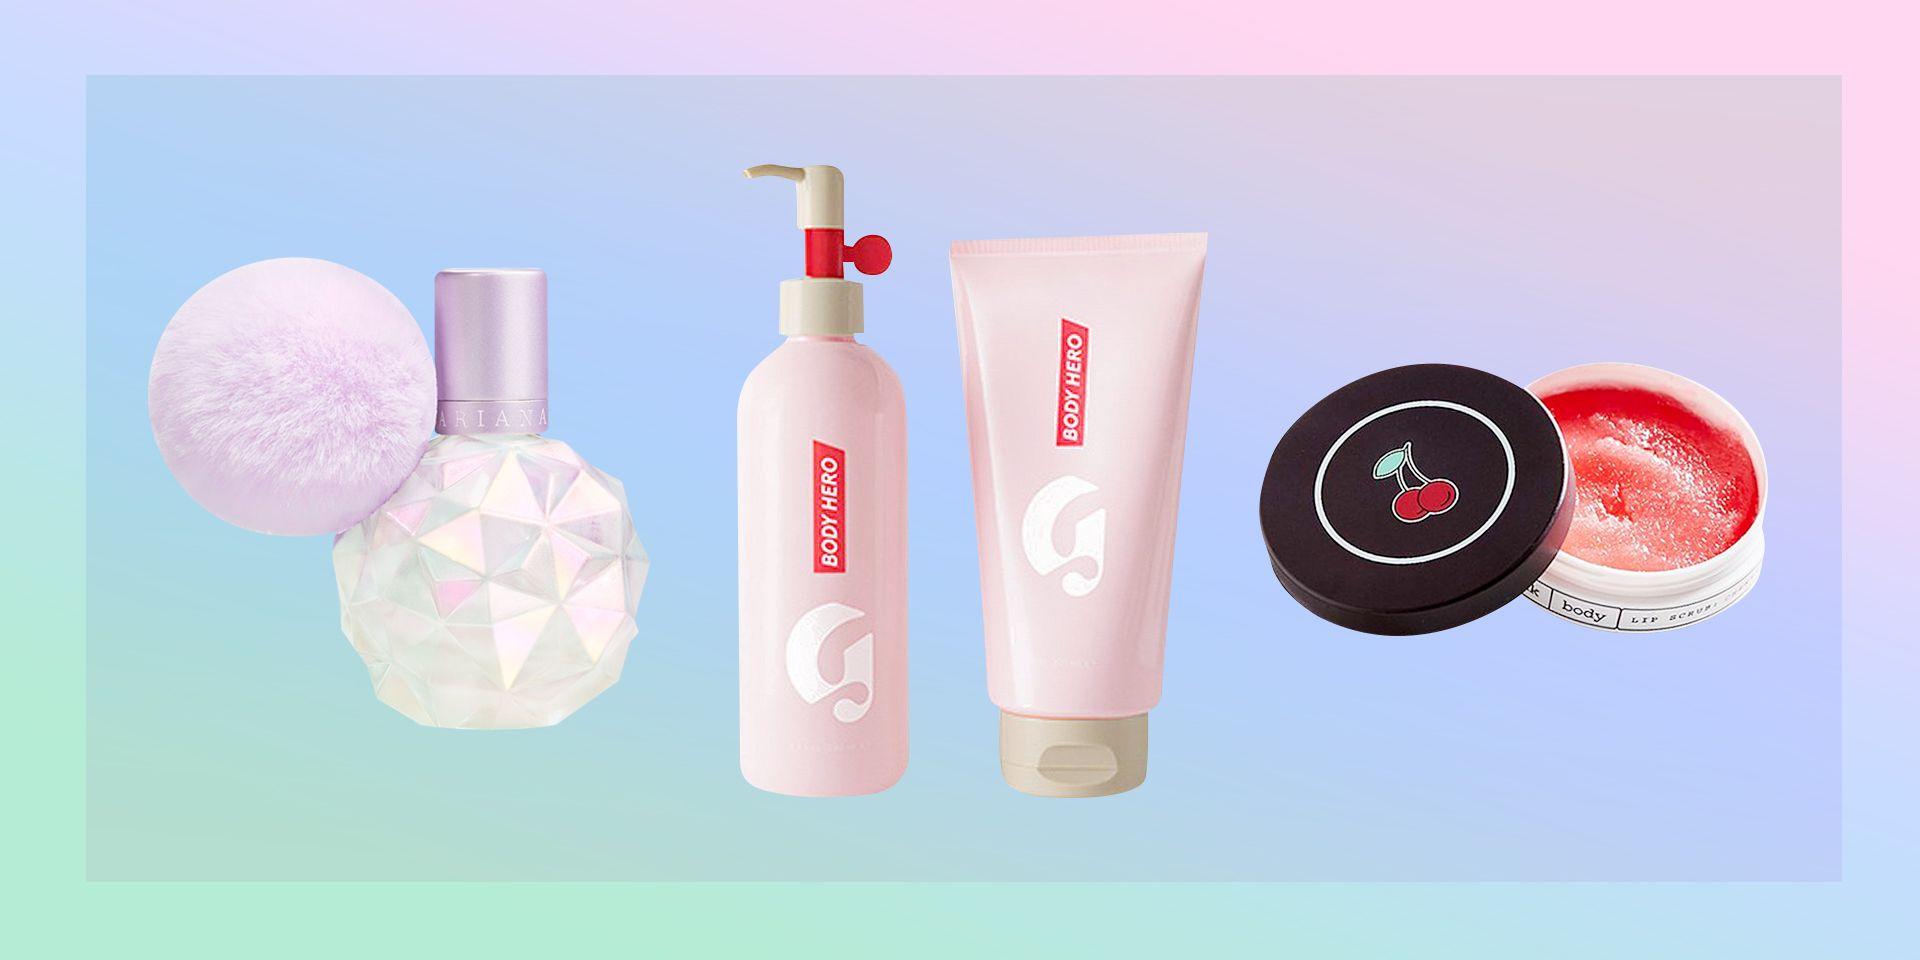 11 <b>Best Beauty Gifts</b> for <b>Christmas 2018</b> - <b>Gift</b> Ideas for <b>Makeup</b> Lovers